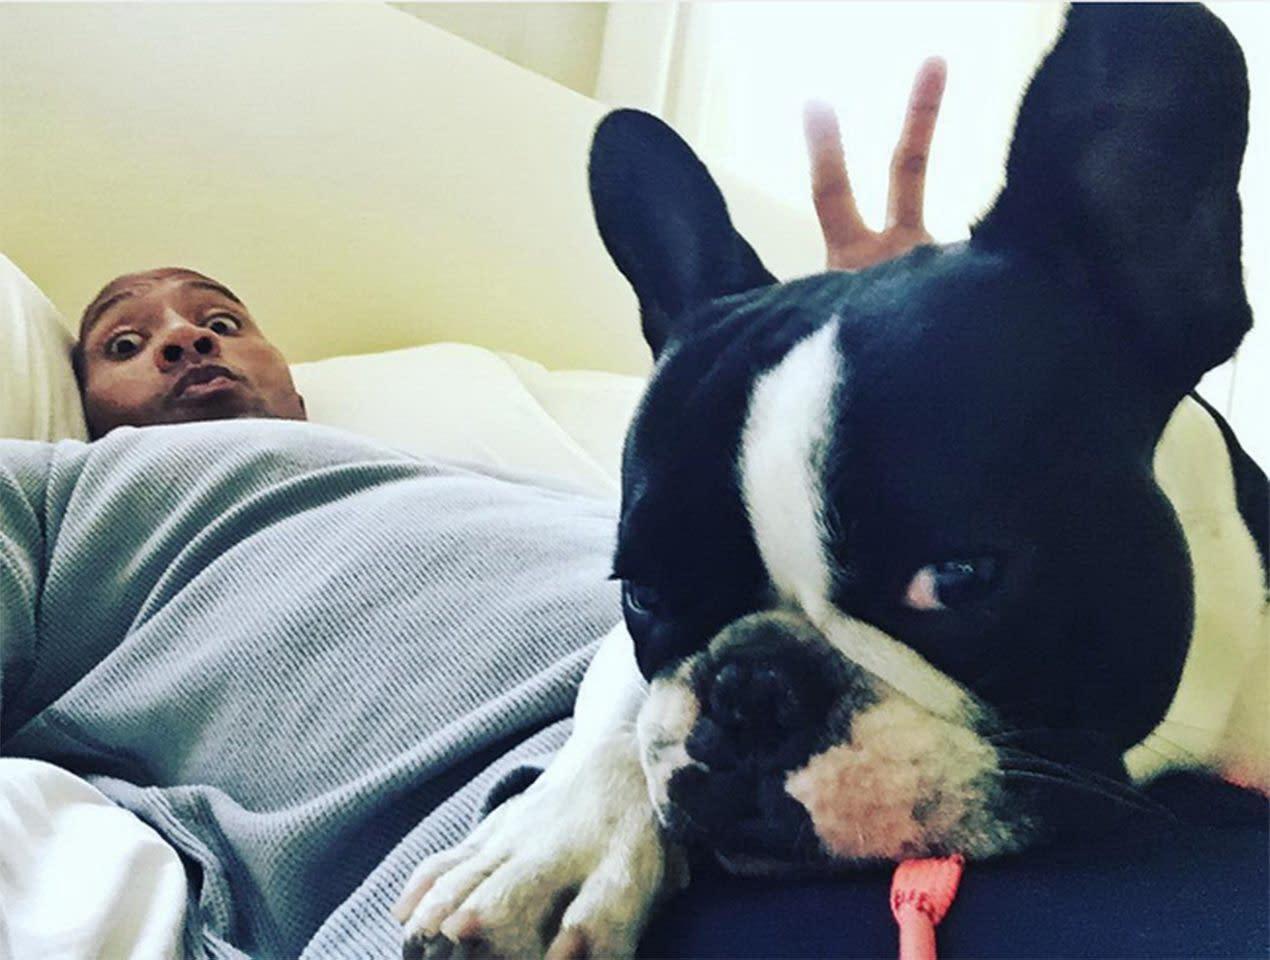 <p>八、巨石強森(Dwayne Johnson):好萊塢硬漢巨石強森私底下也是個愛狗的好好先生,家中最多曾養了五六隻狗,是出了名的狗爸。而巨石強森也經常在IG上放自己與愛狗們的各種合照,甚至還會跟狗狗嘟嘴玩親親。顯然在愛犬的面前,銀幕鐵漢也成了軟心腸。(圖:巨石強森IG) </p>